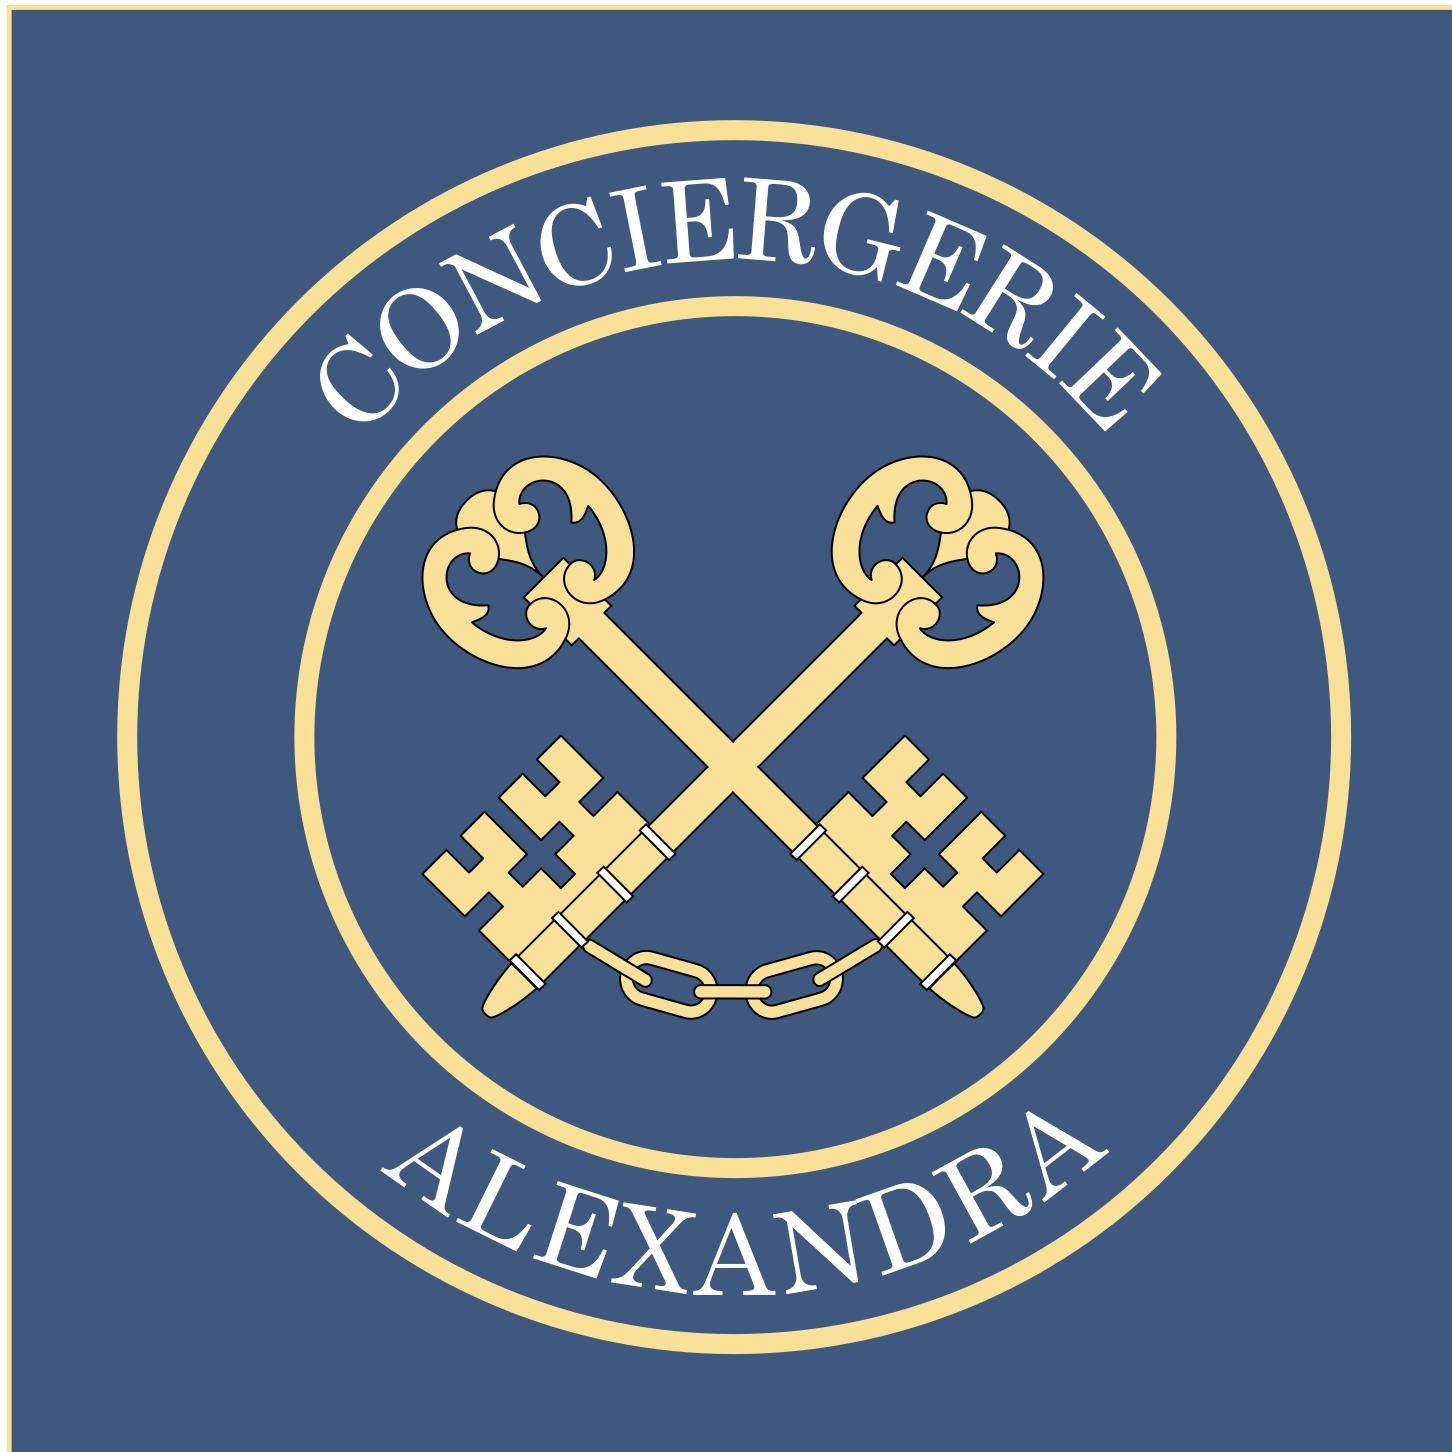 Logo de Conciergerie Alexandra